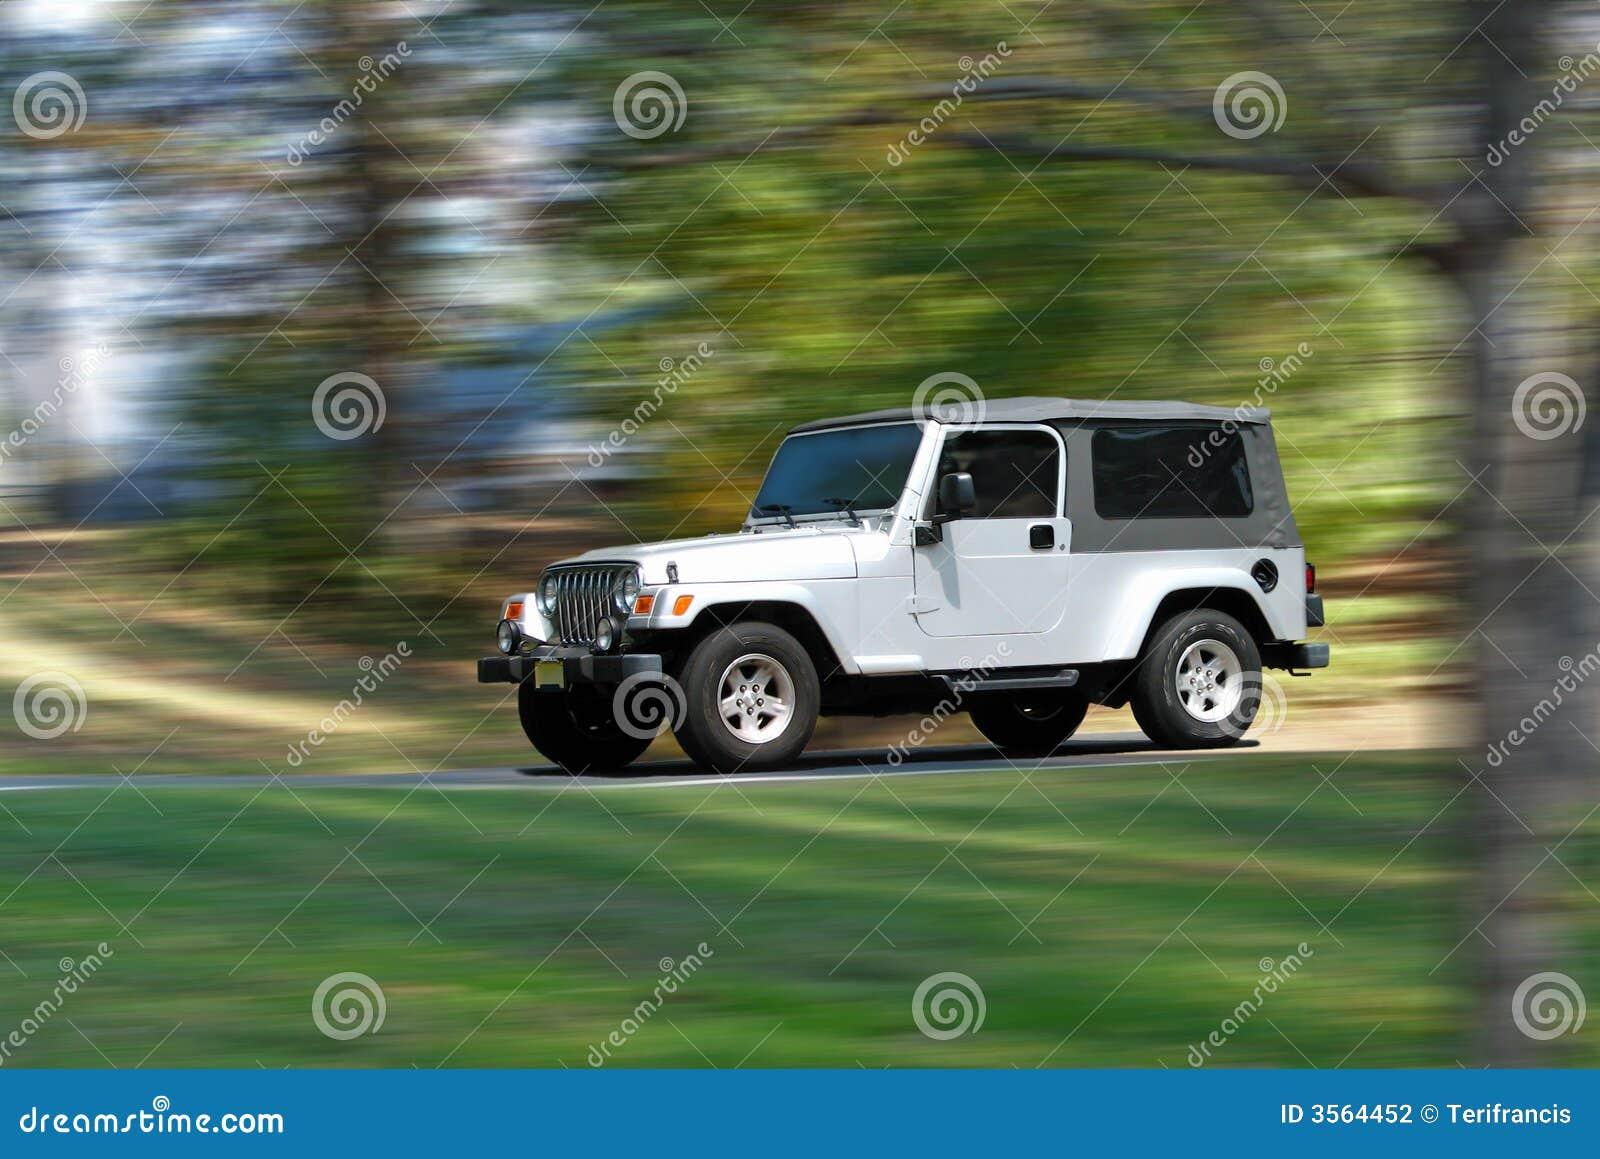 Jeep veloce